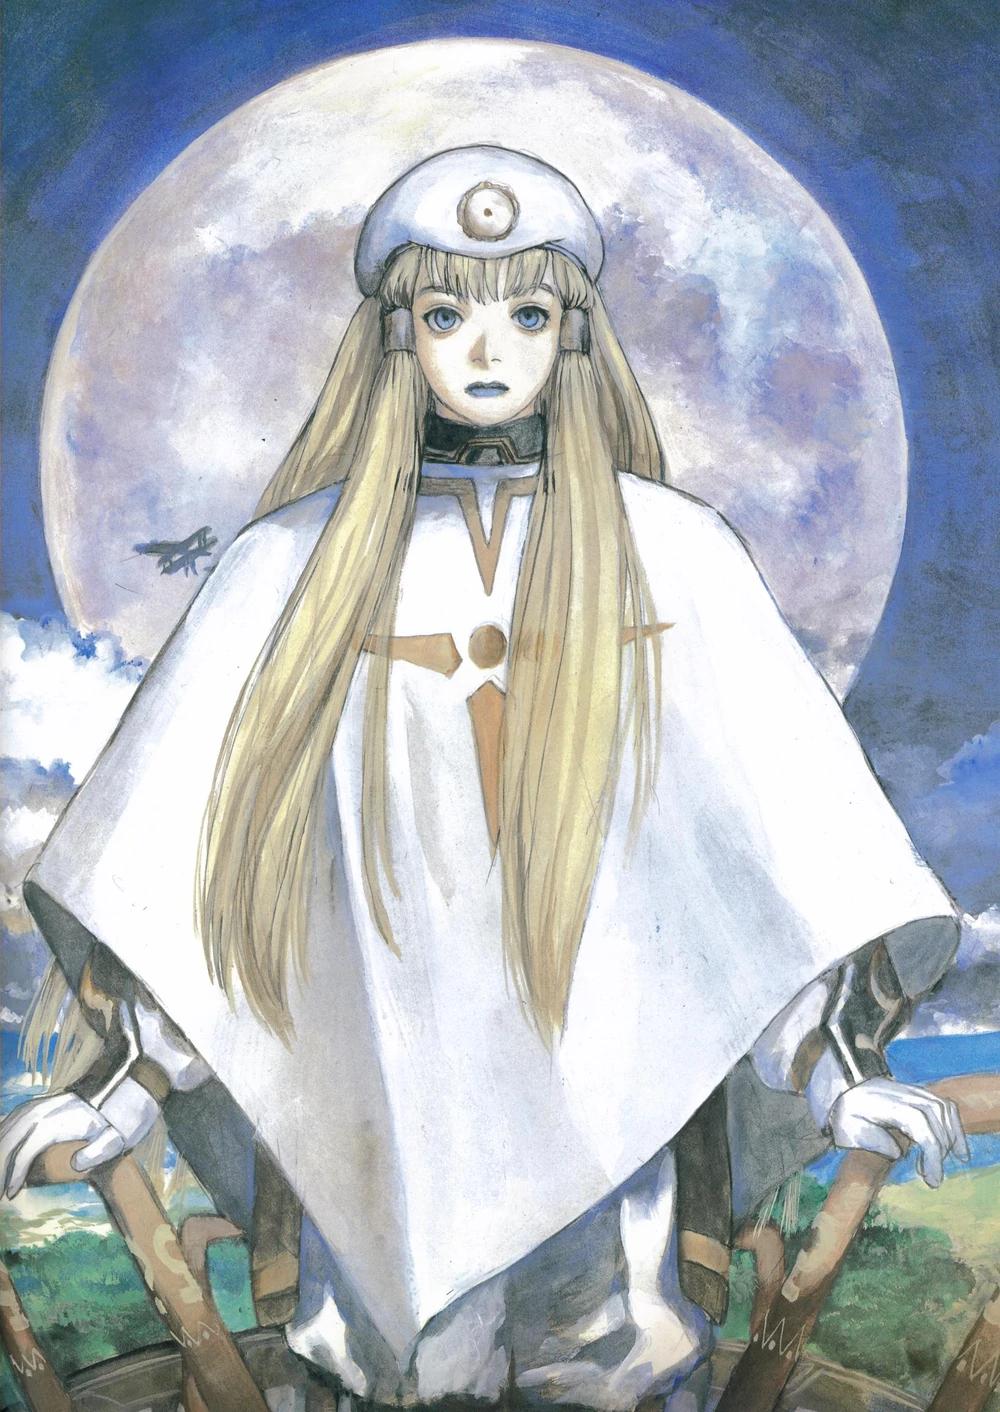 dianna soreil illustration by kenji tsuruta イラスト 鶴田 謙二 ガンダム イラスト